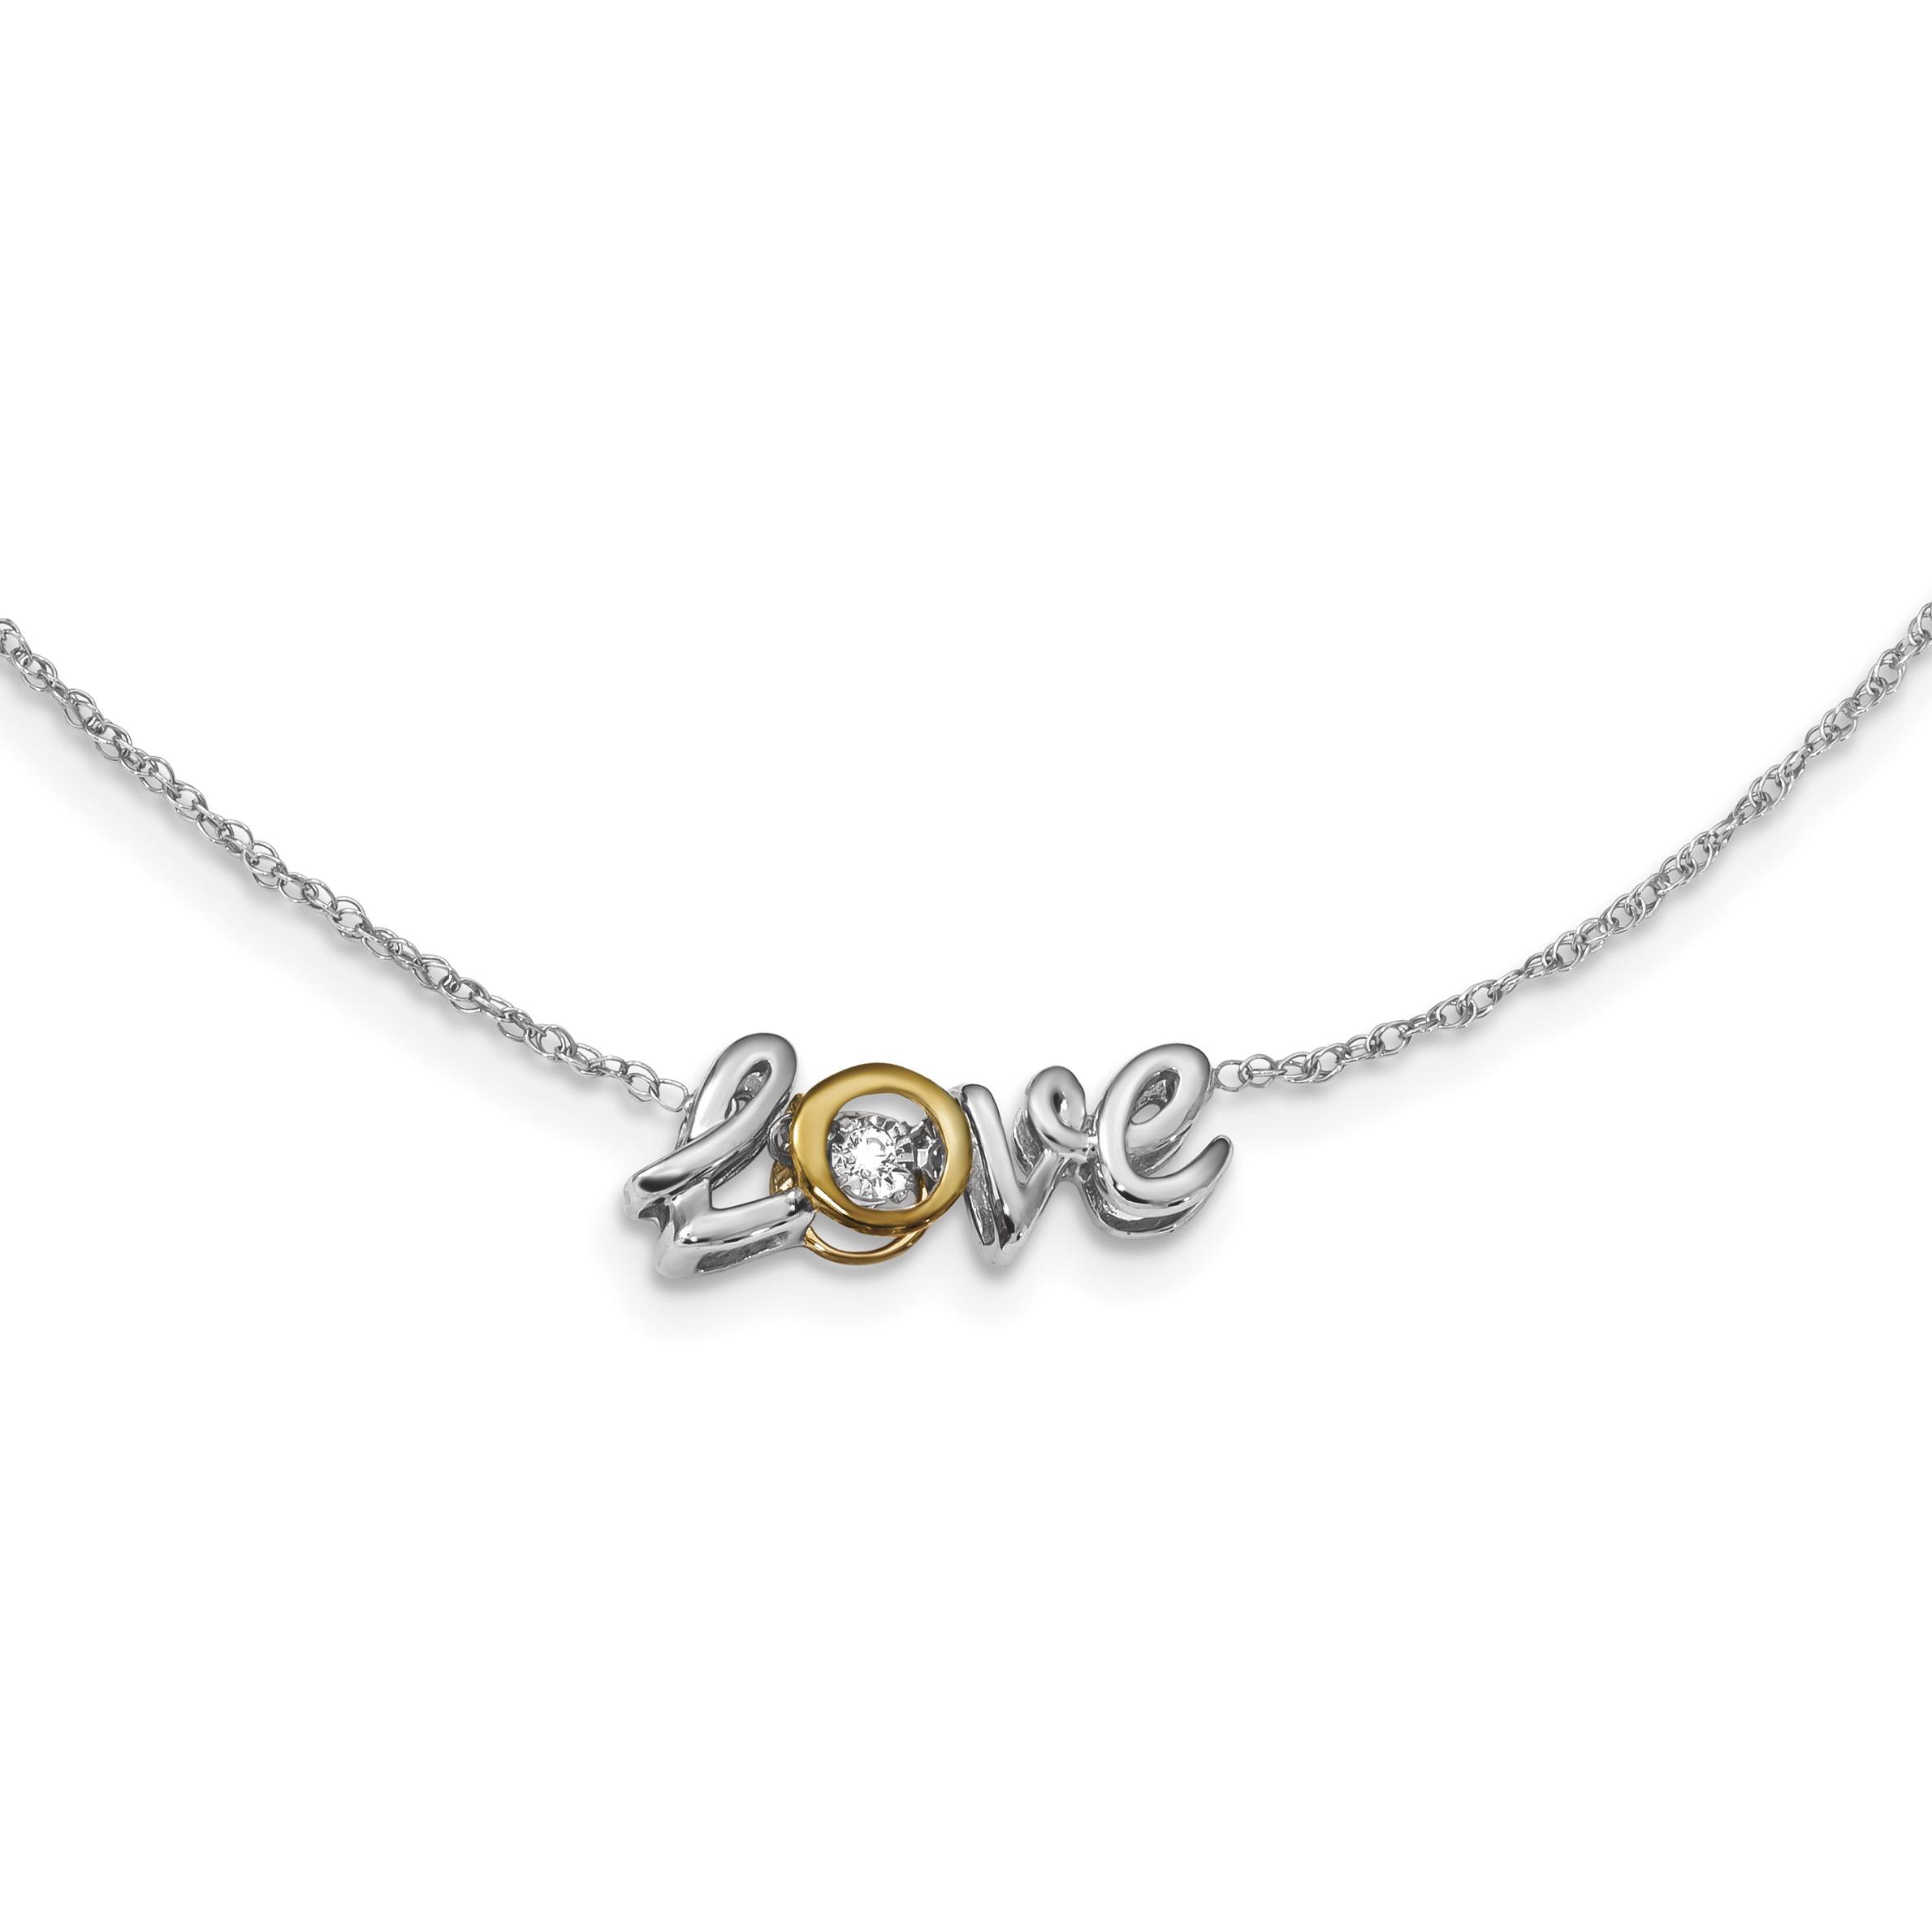 14k White/Yellow Gold Love Vibrant Diamond 18in Necklace